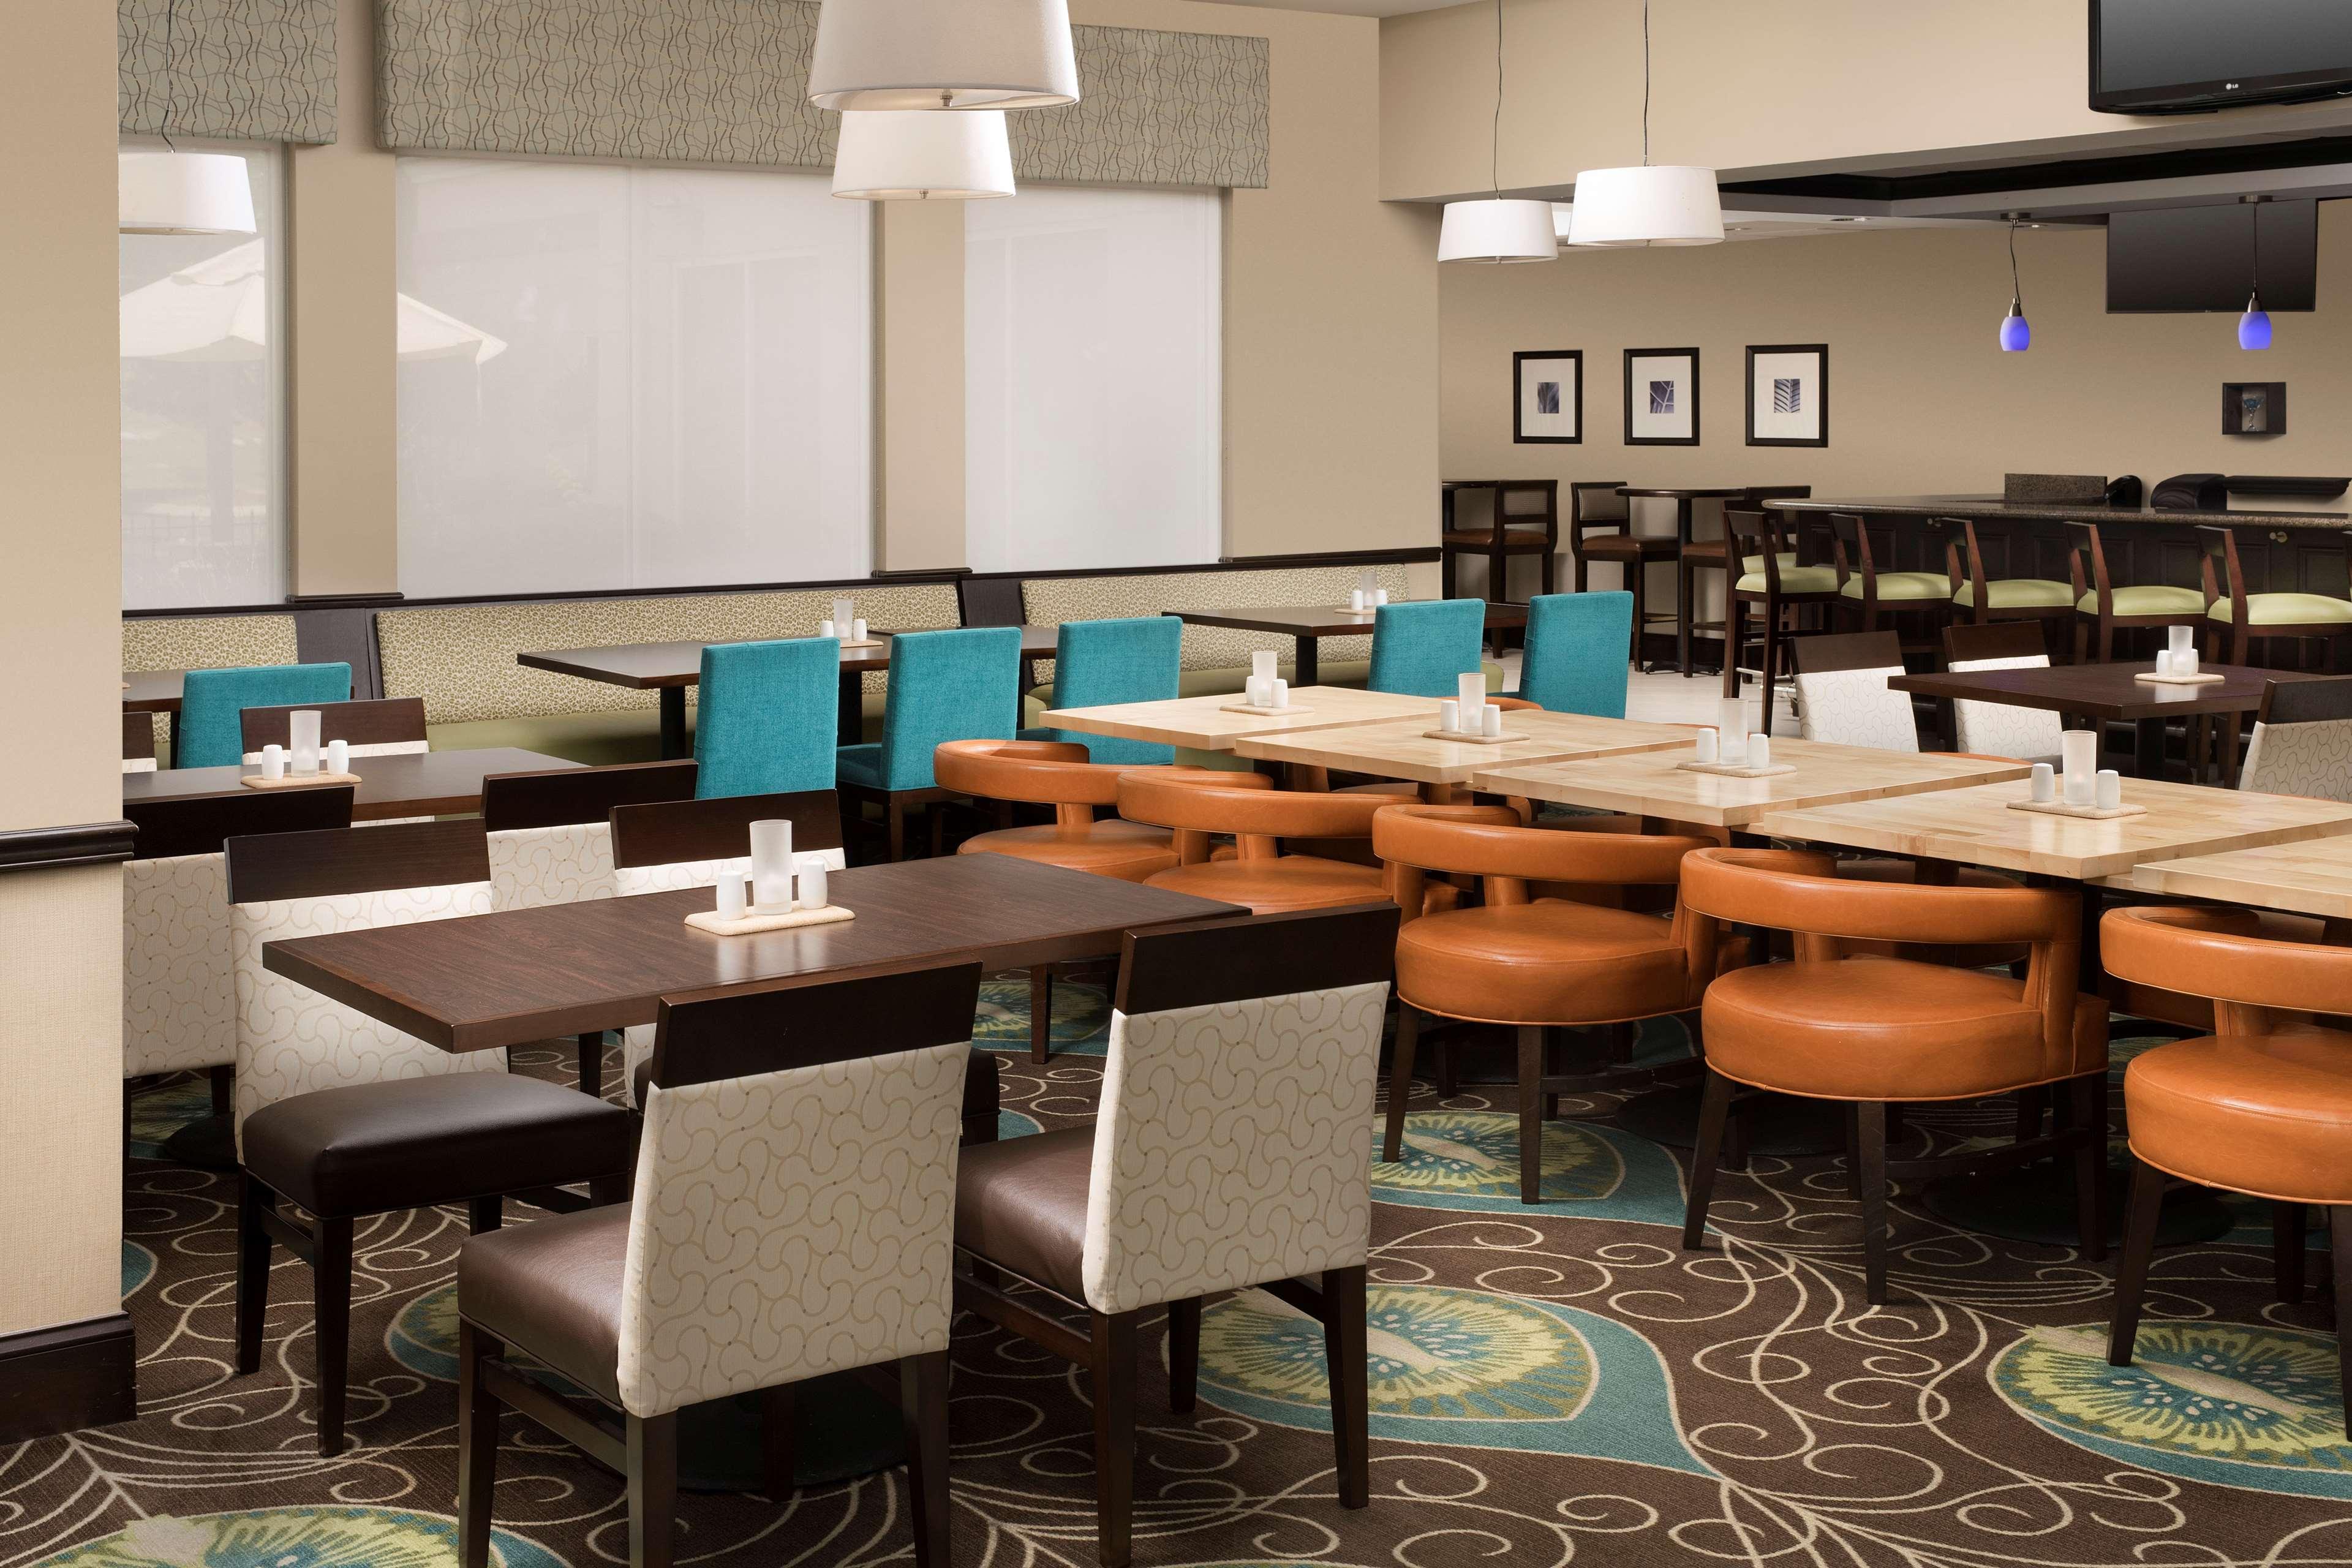 Hilton Garden Inn Winston-Salem/Hanes Mall image 6